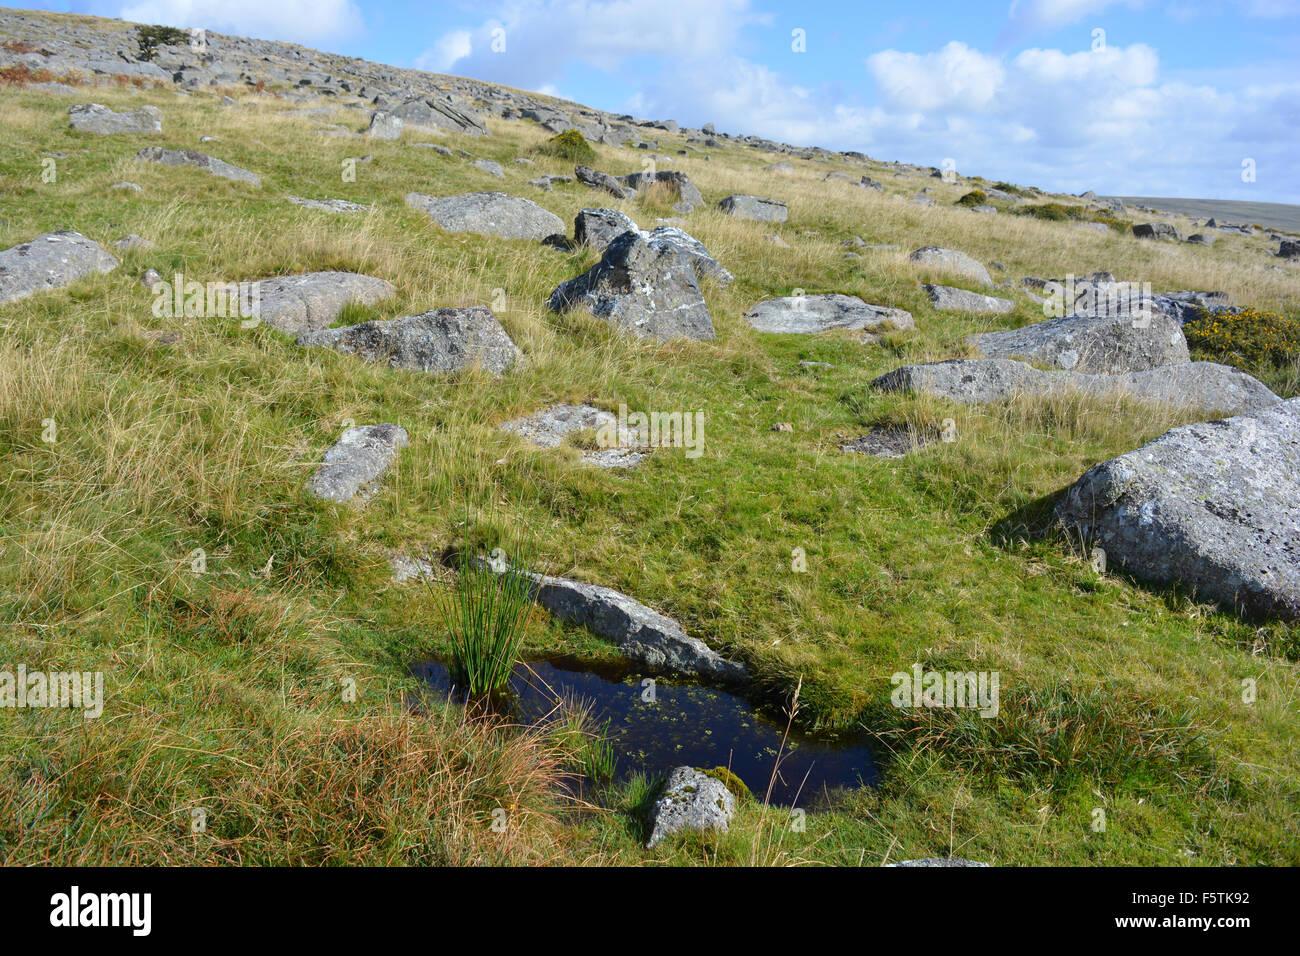 Landscape near the Staple Tors, Dartmoor National Park, Devon, England - Stock Image